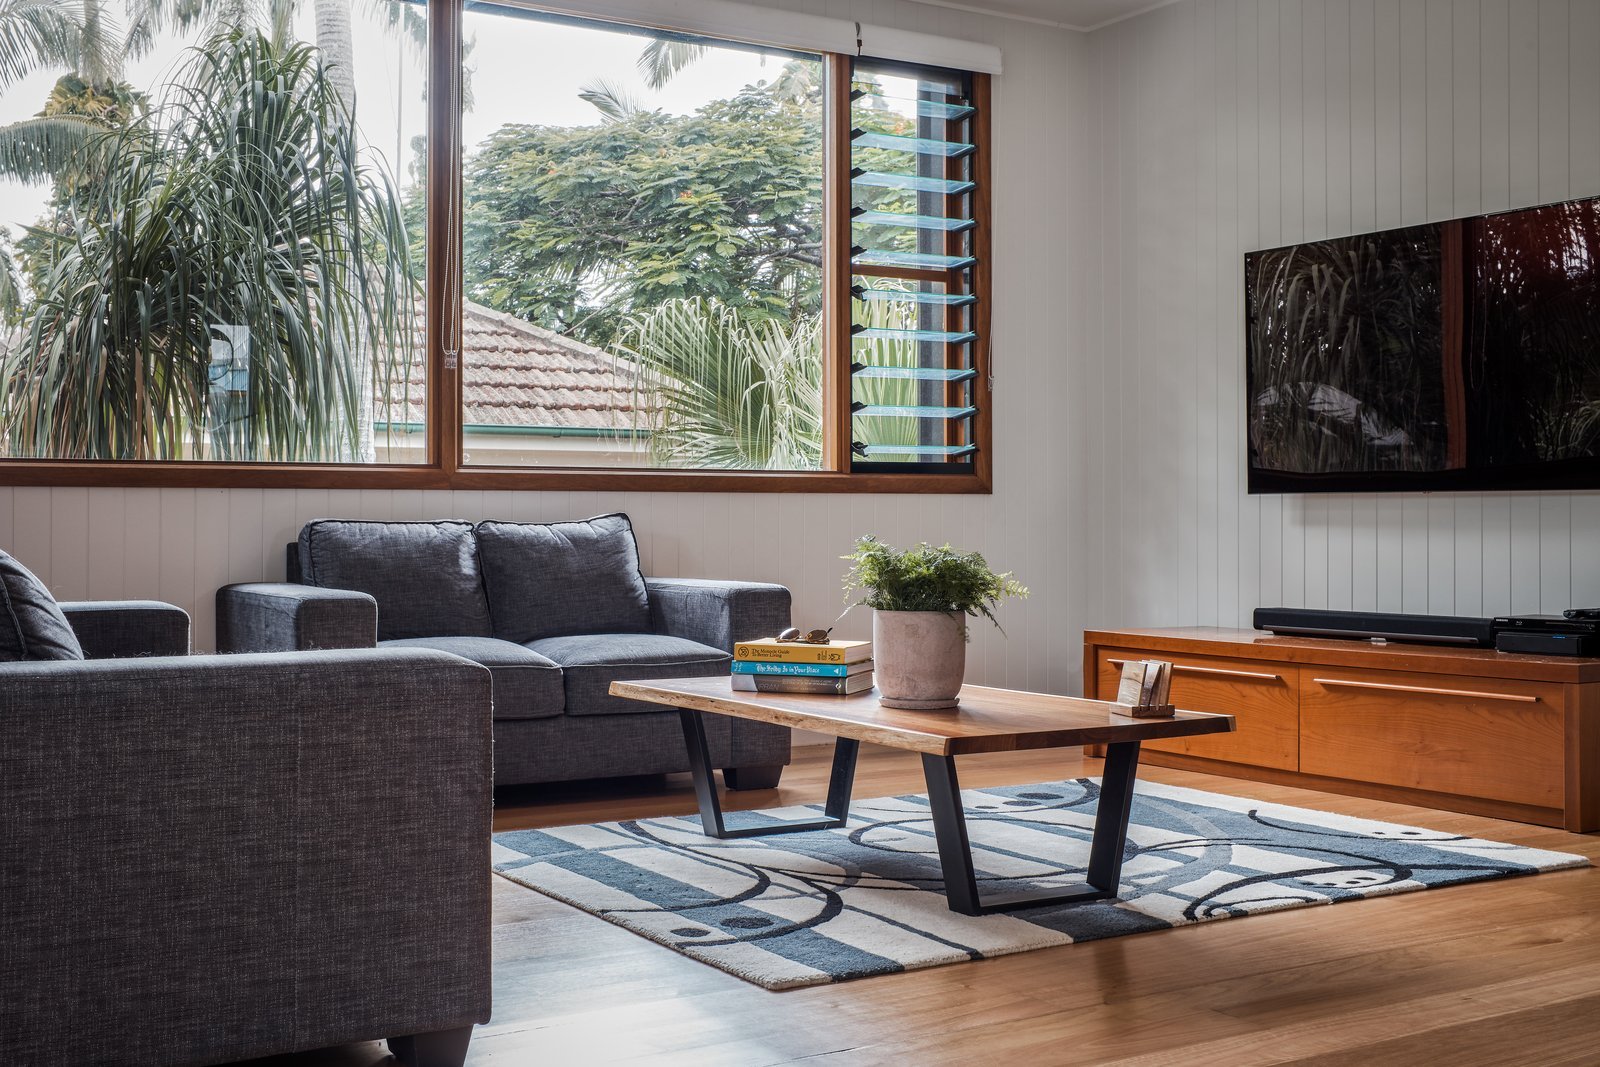 Keith Street House living room